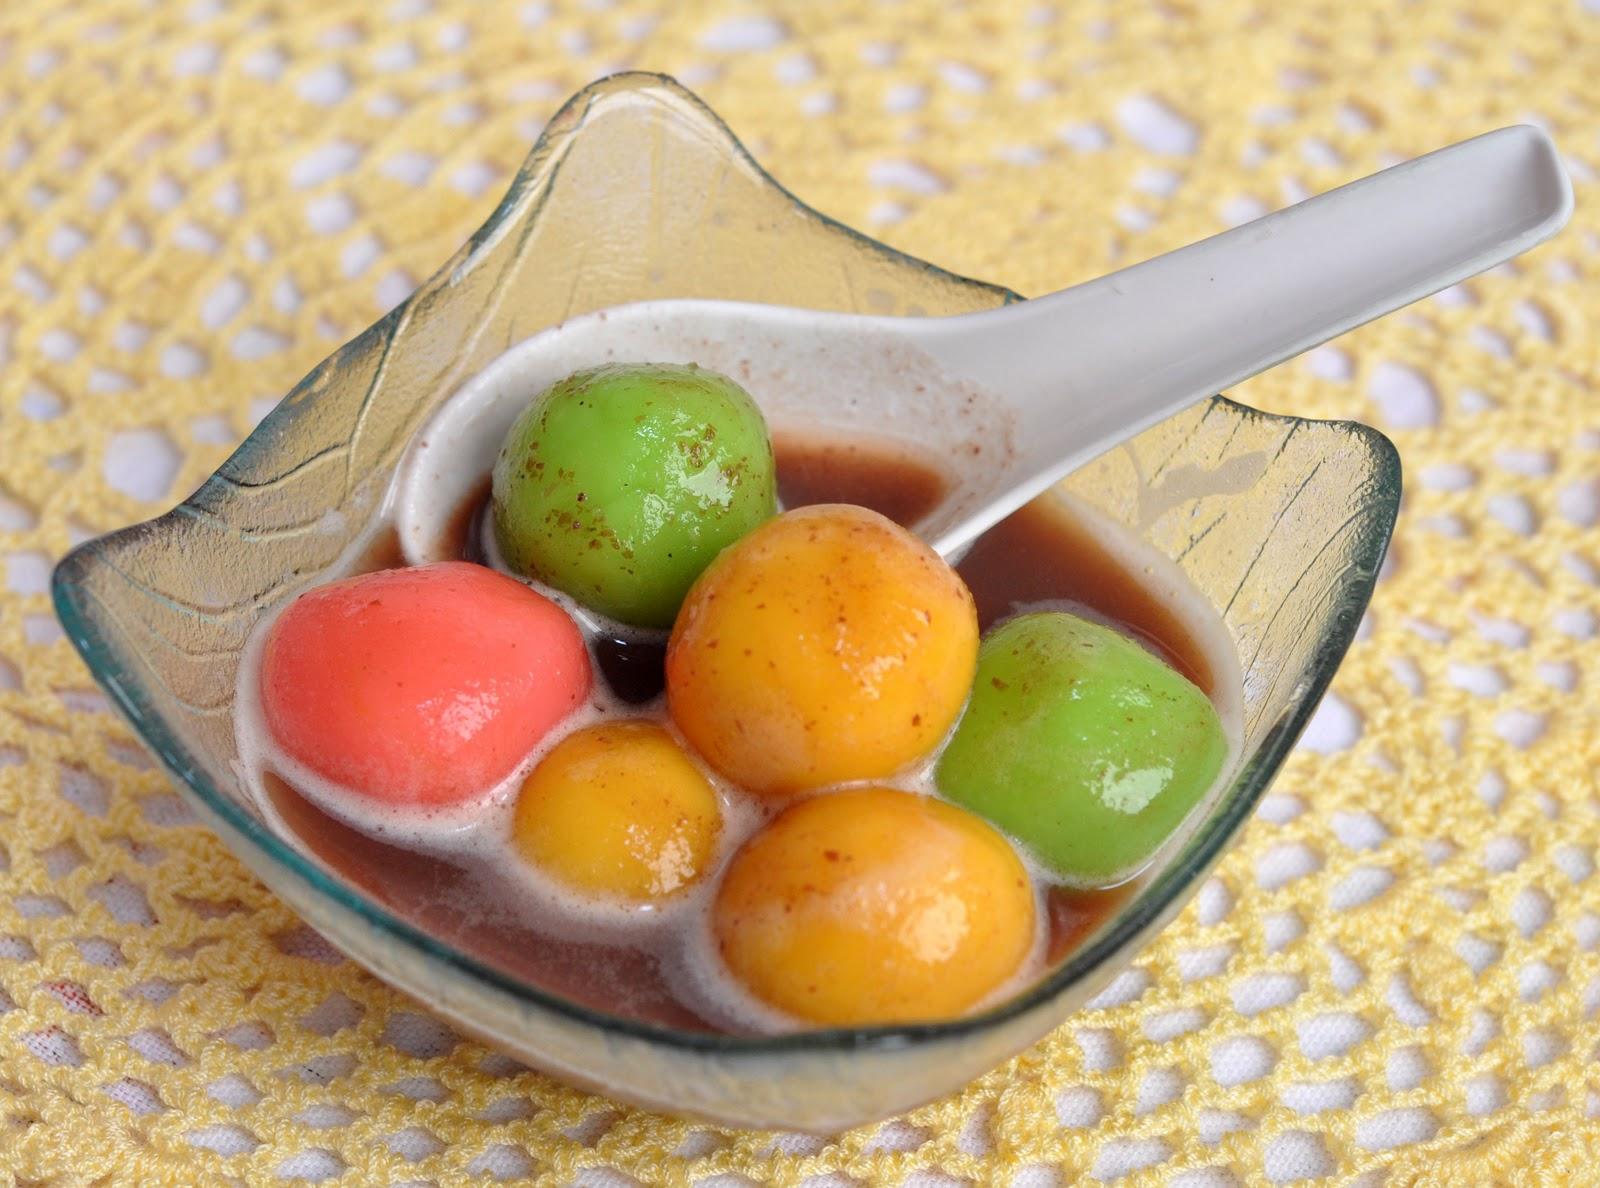 Veronica's Kitchen: Dumplings in Red Bean Soup